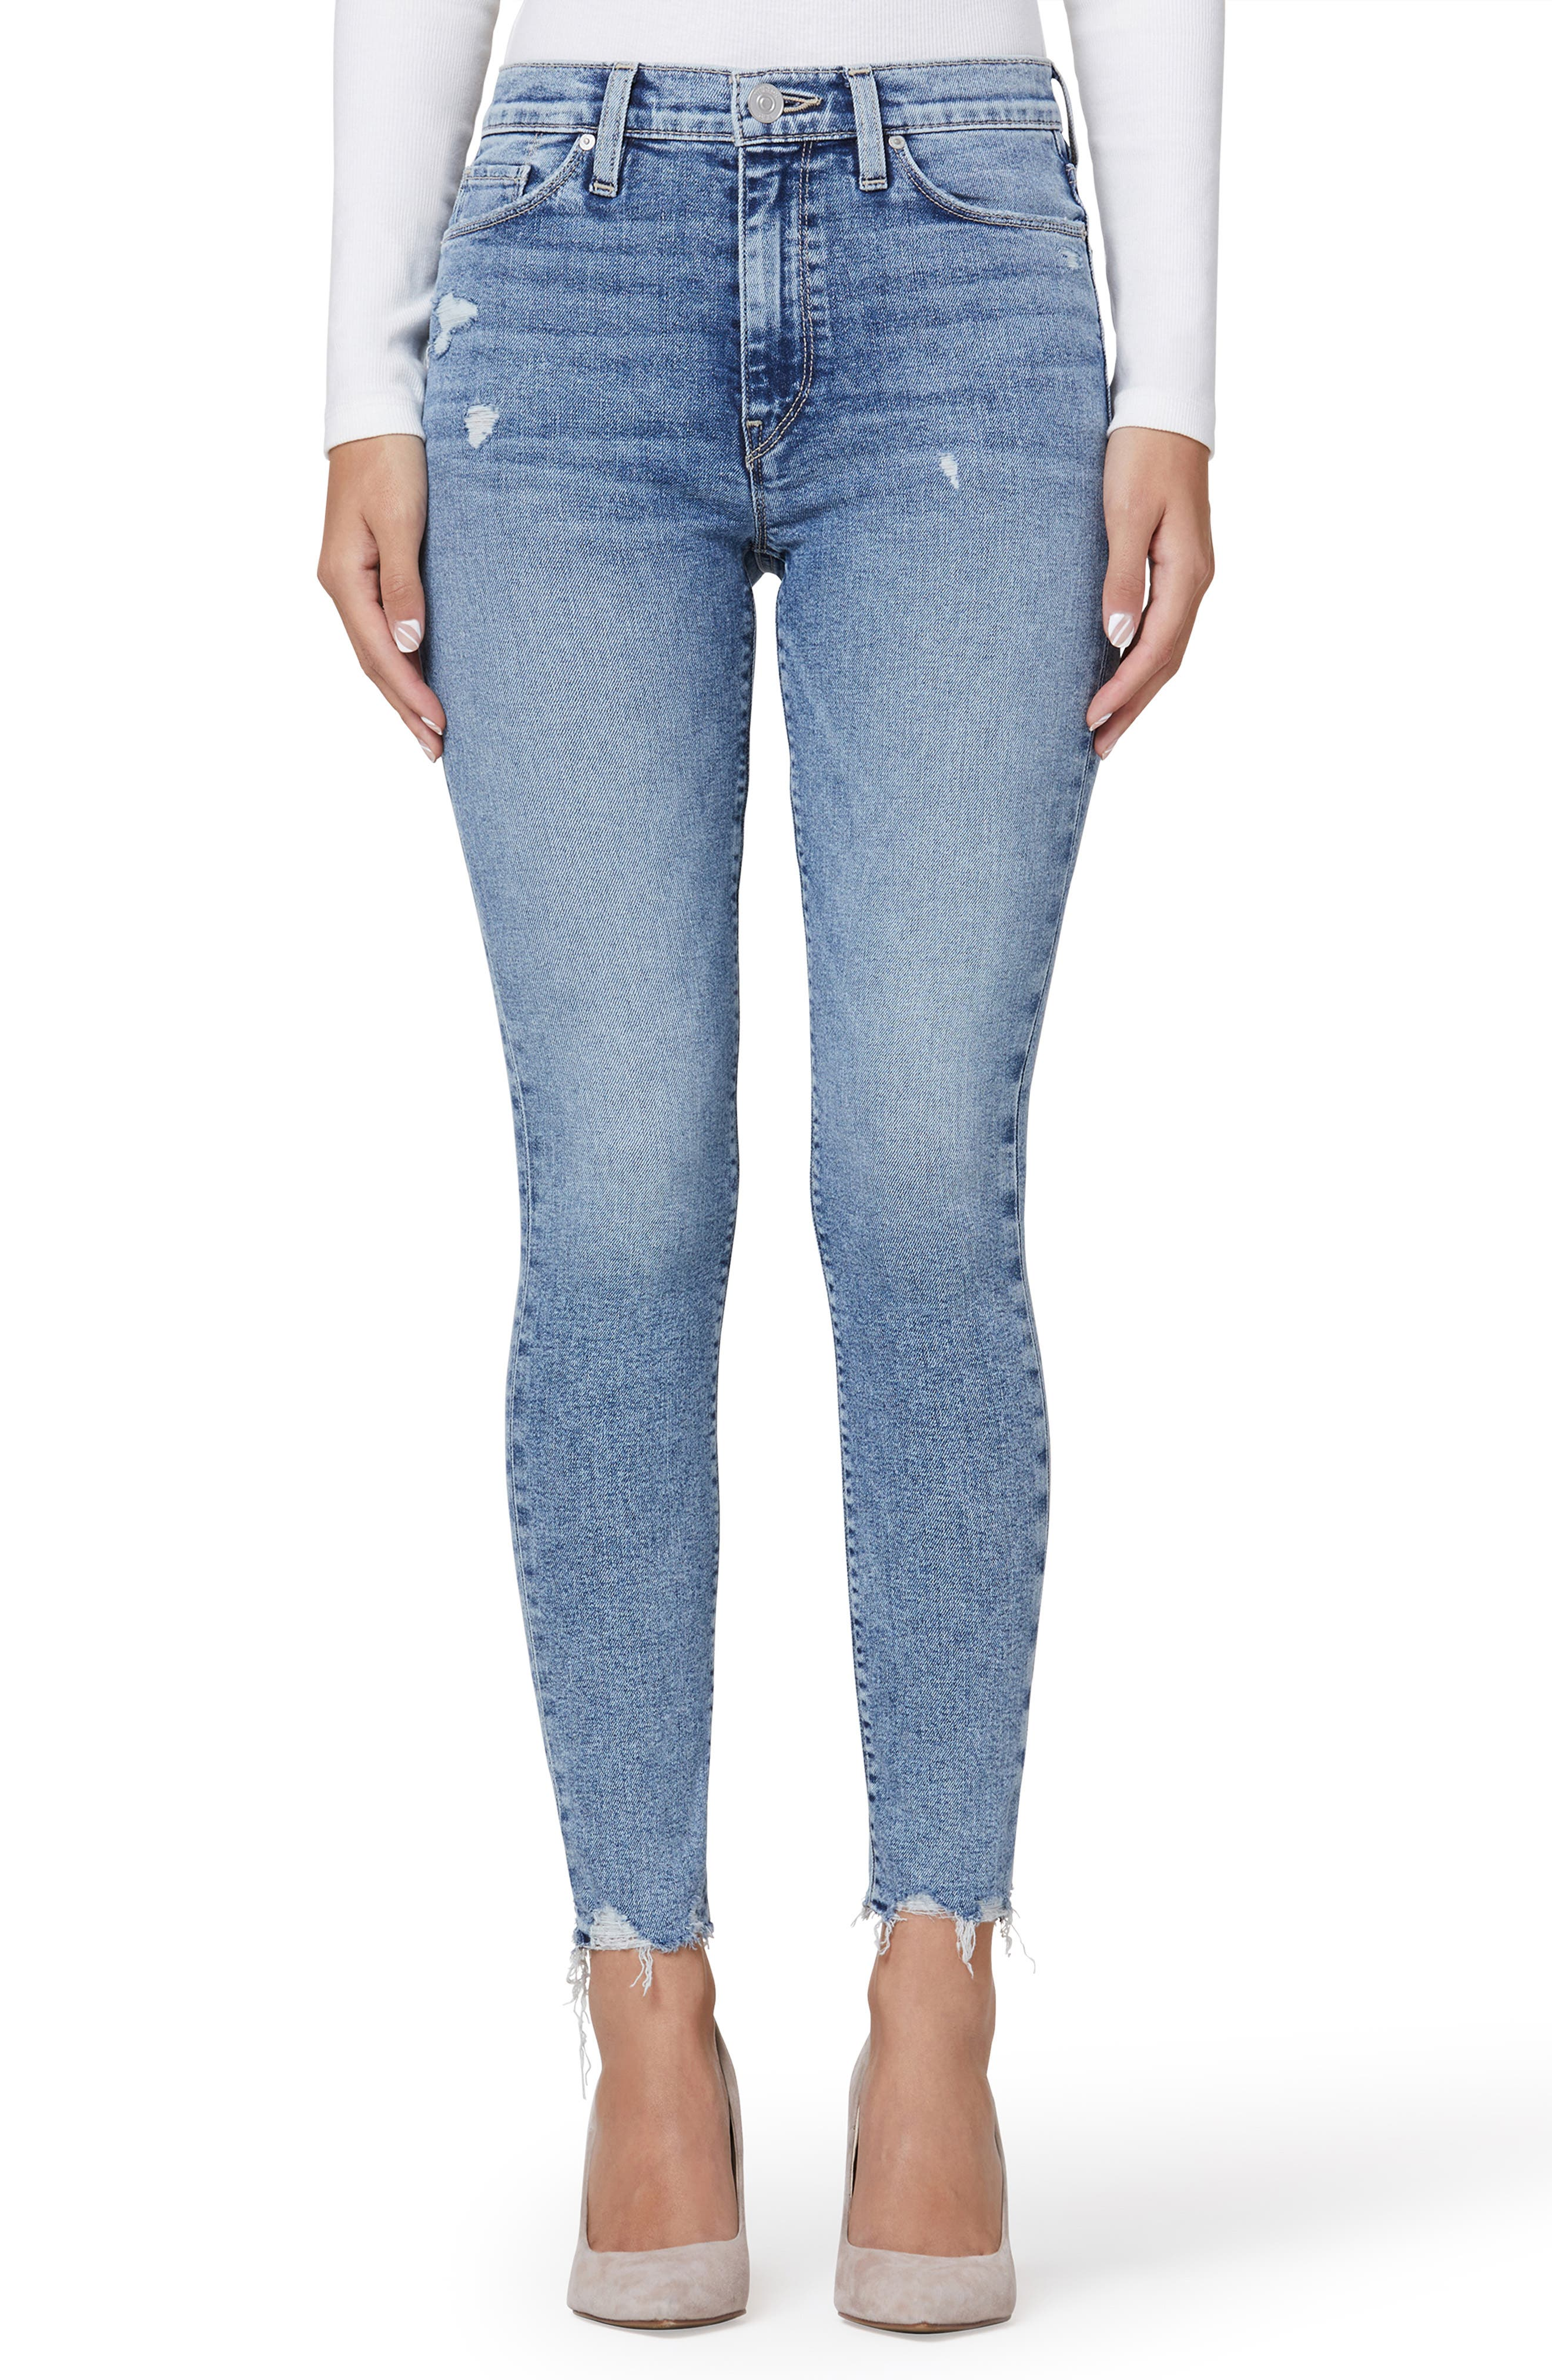 Barbara High Waist Distressed Super Skinny Jeans